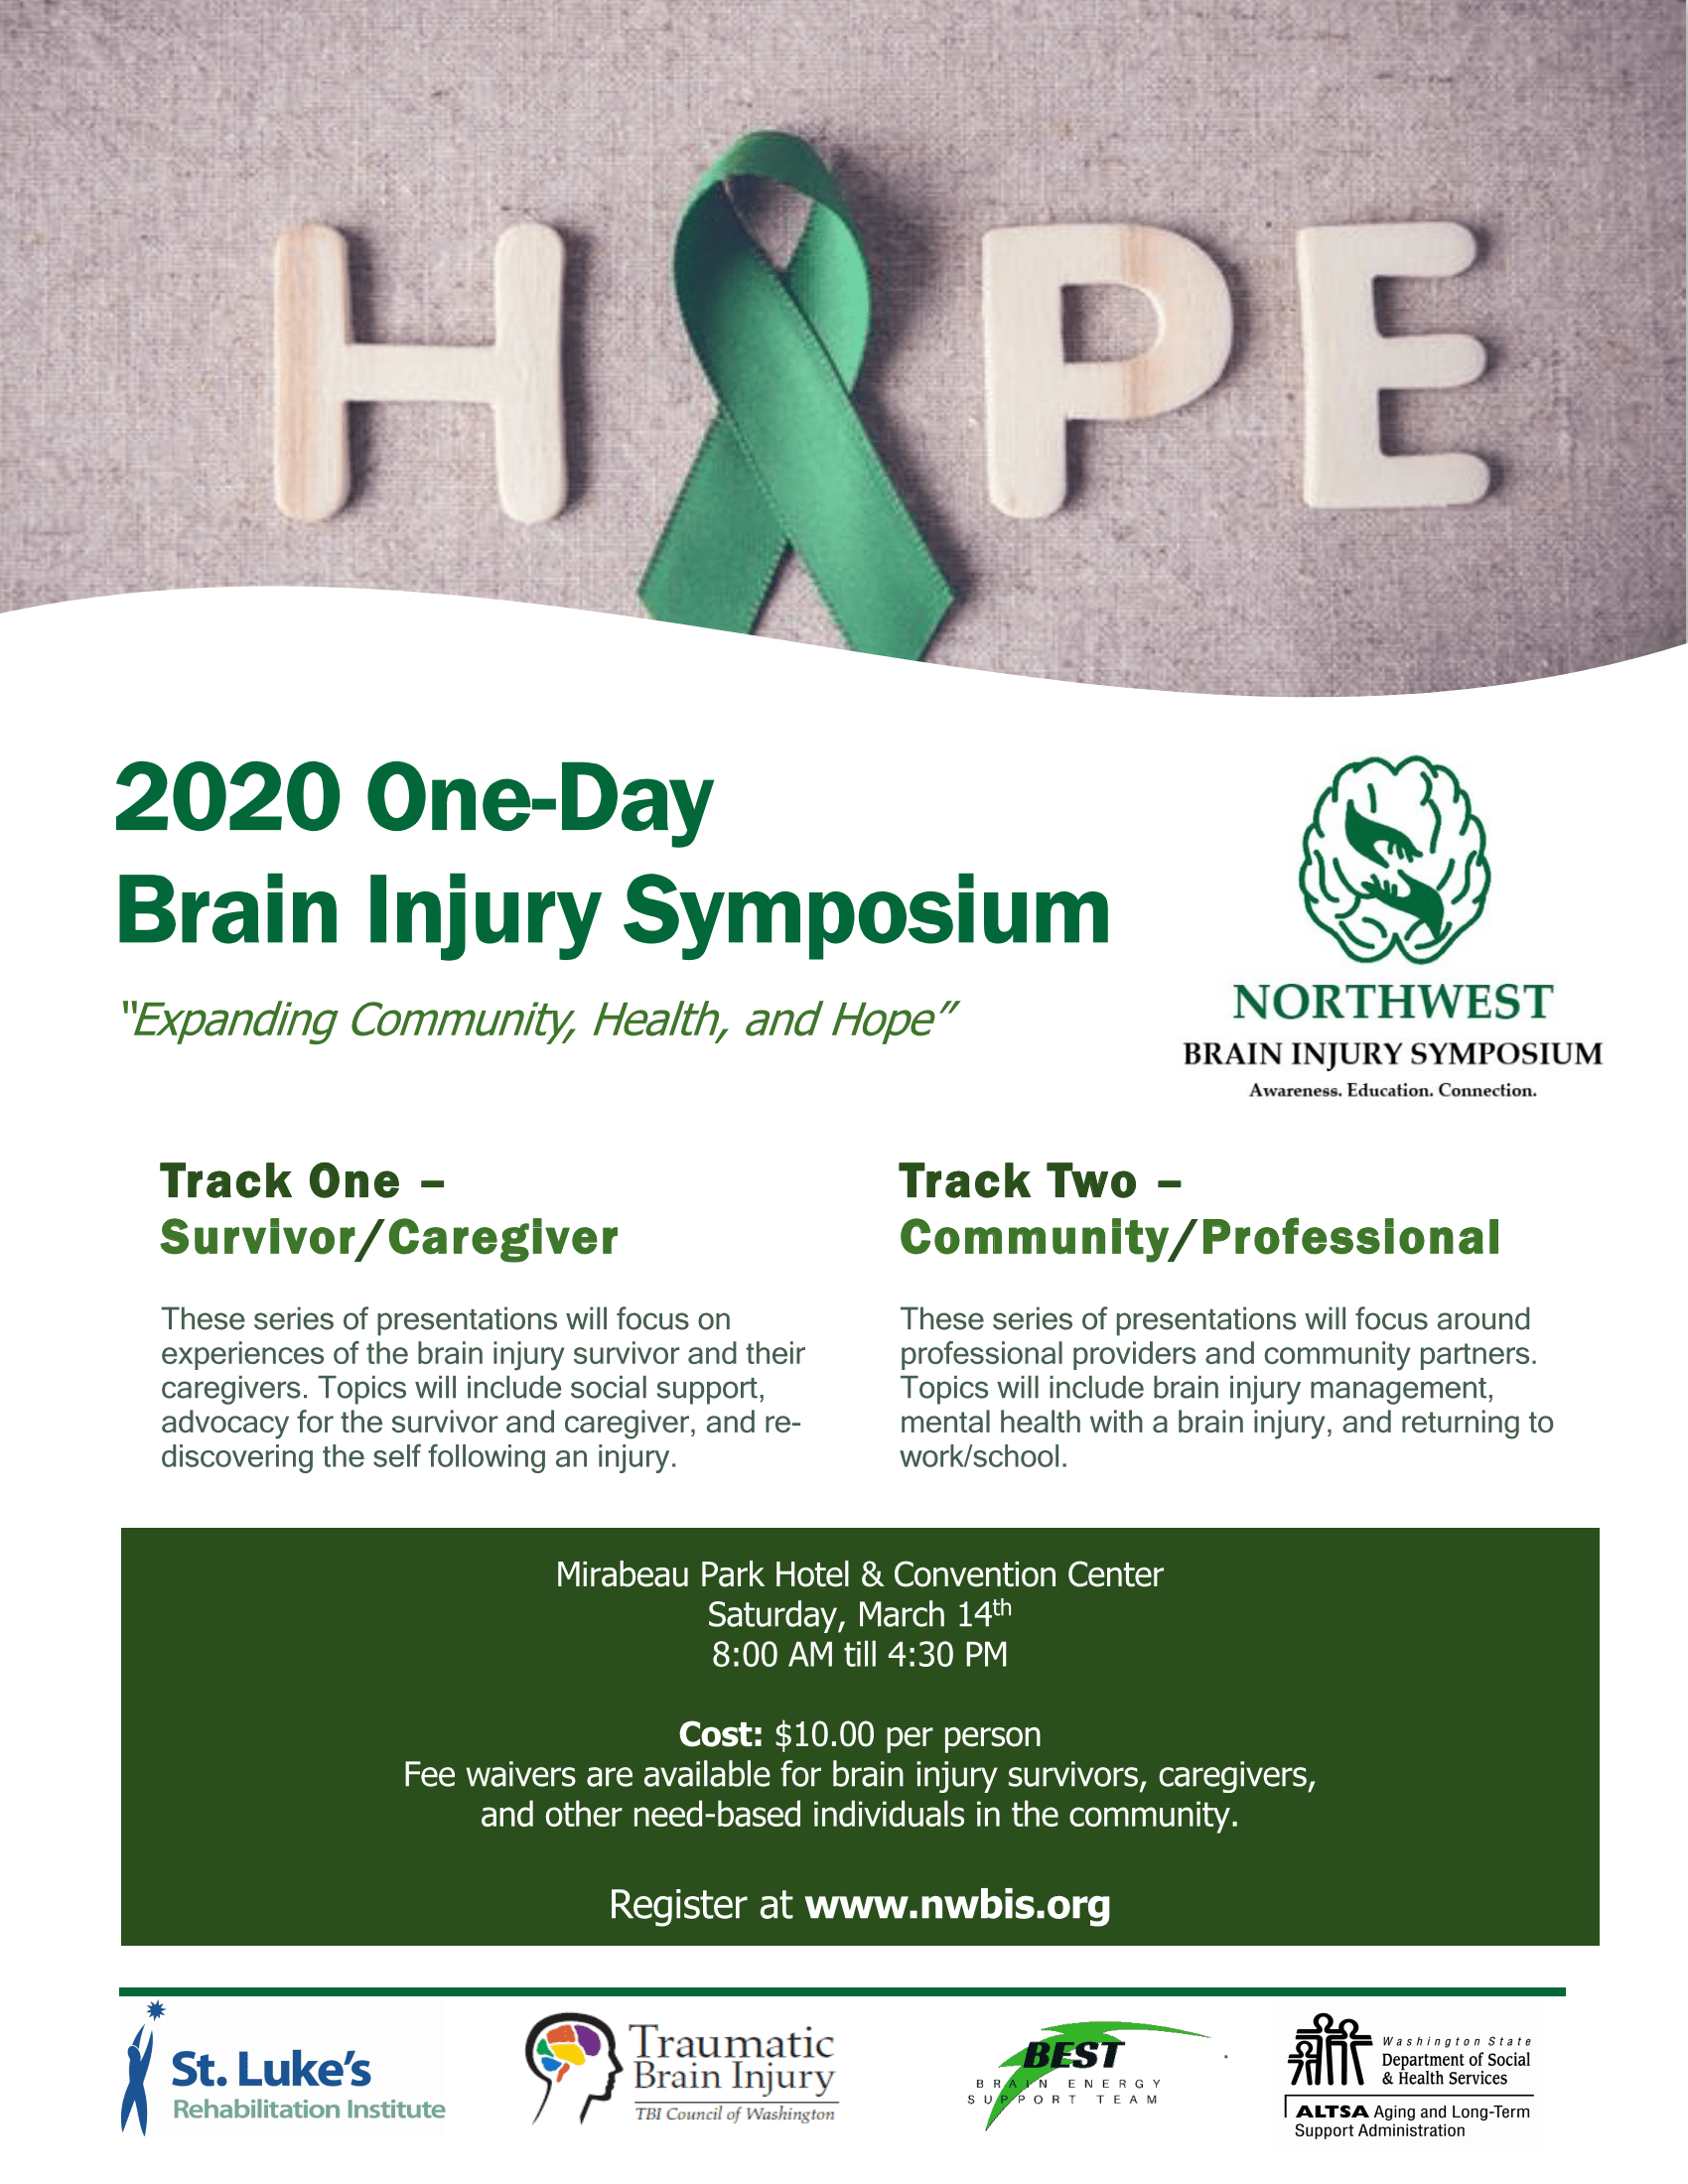 (Spokane): One Day Brain Injury Symposium March 14, 2020